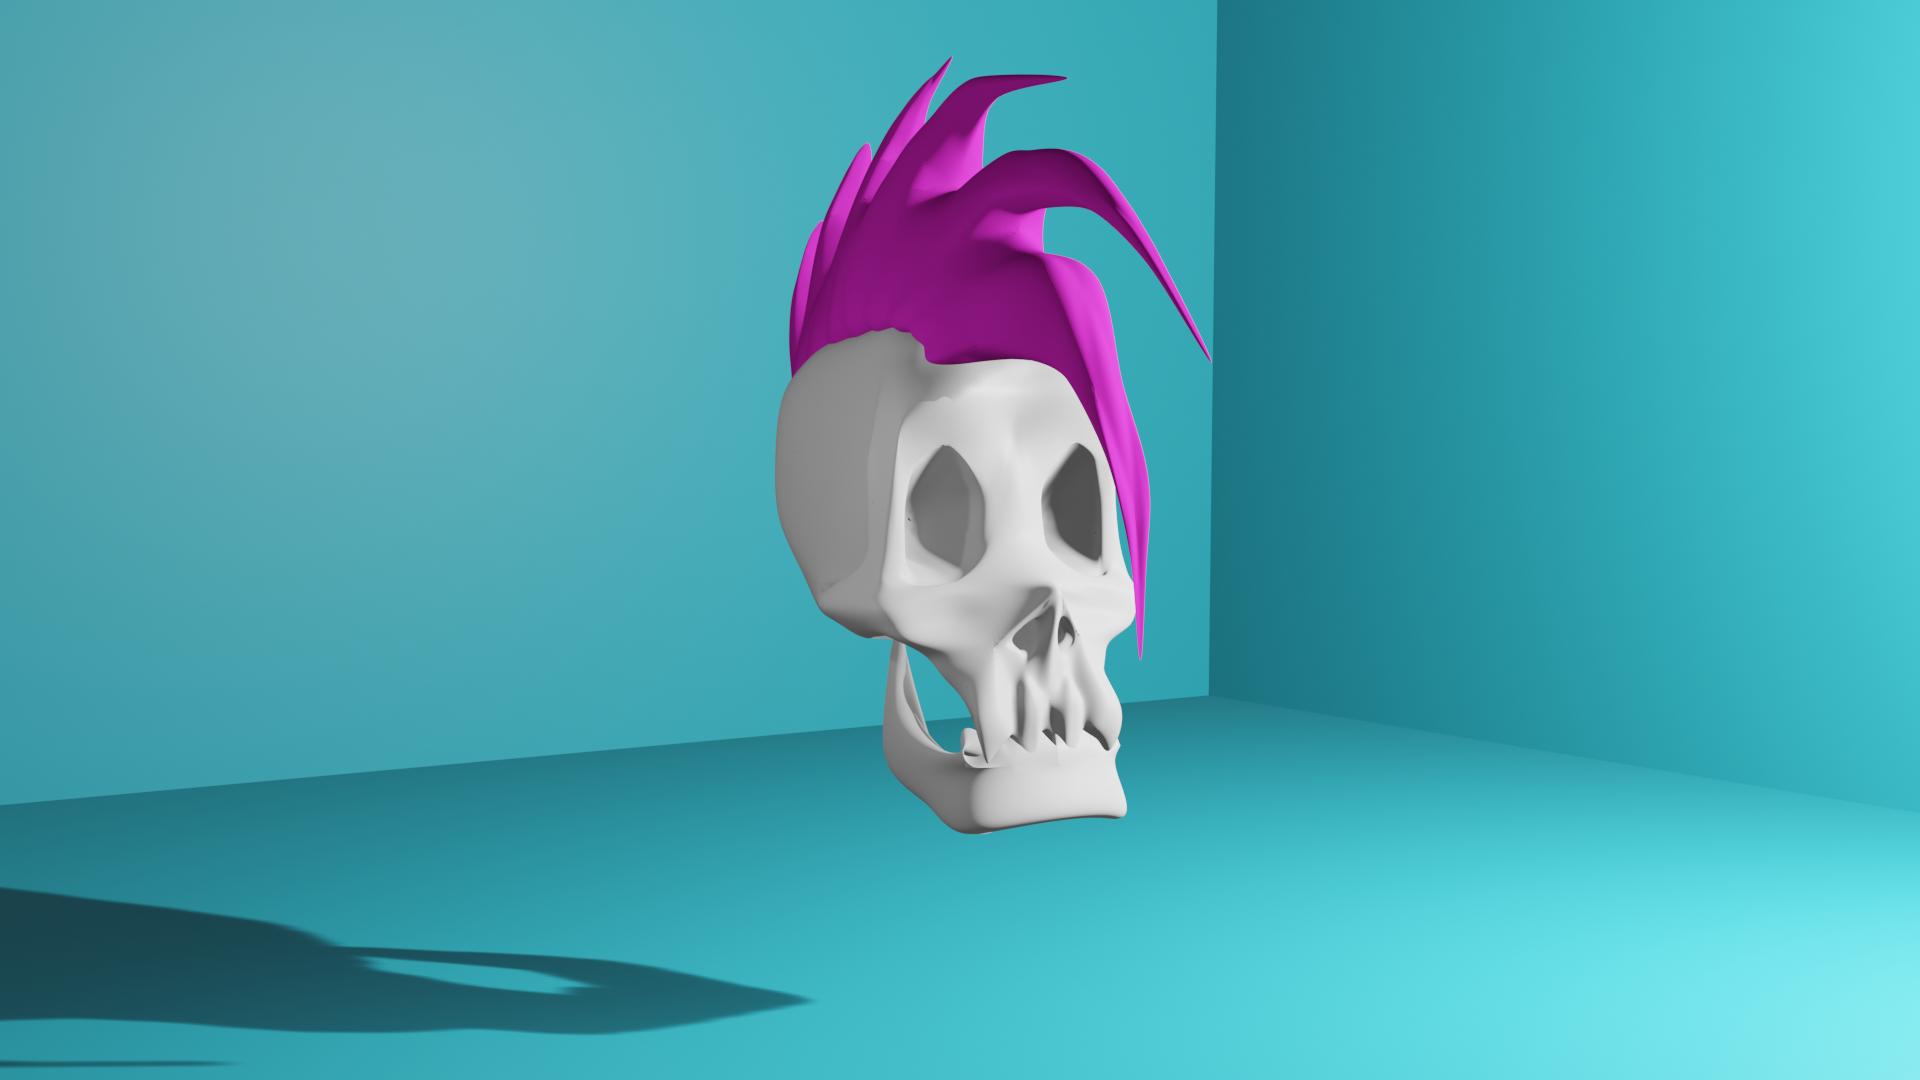 skull feat. mohawk